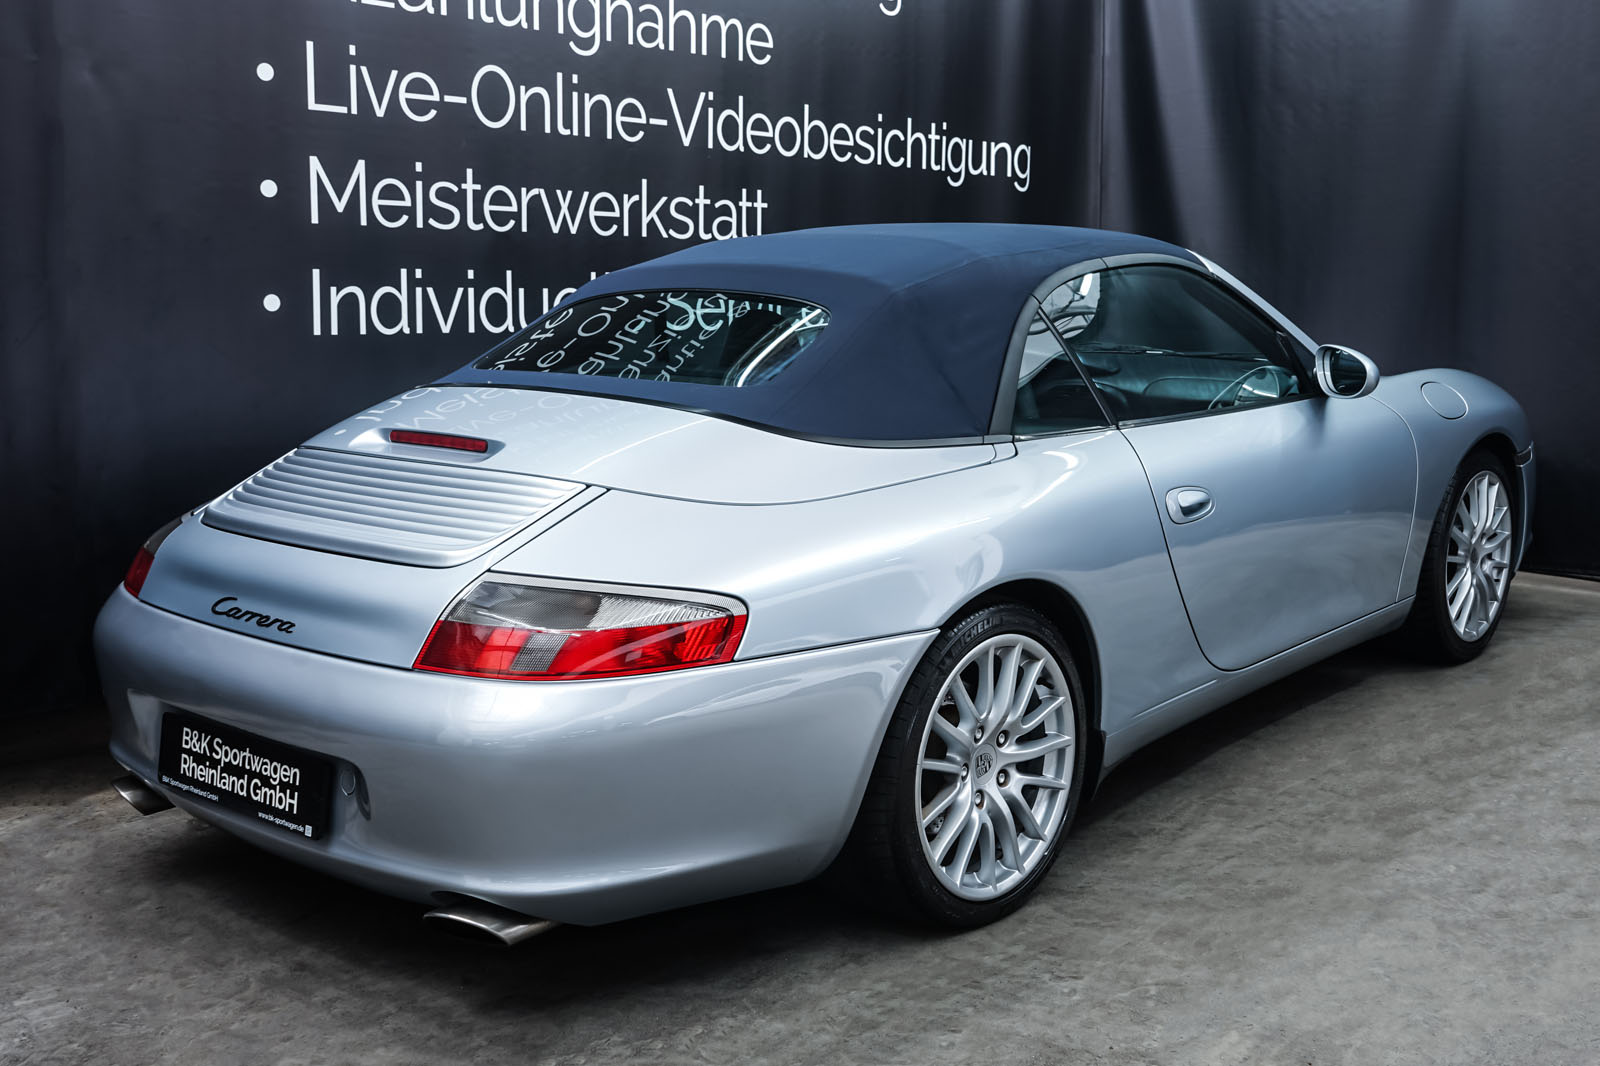 Porsche_996_Cabrio_Silber_Dunkelblau_POR-1724_20_w